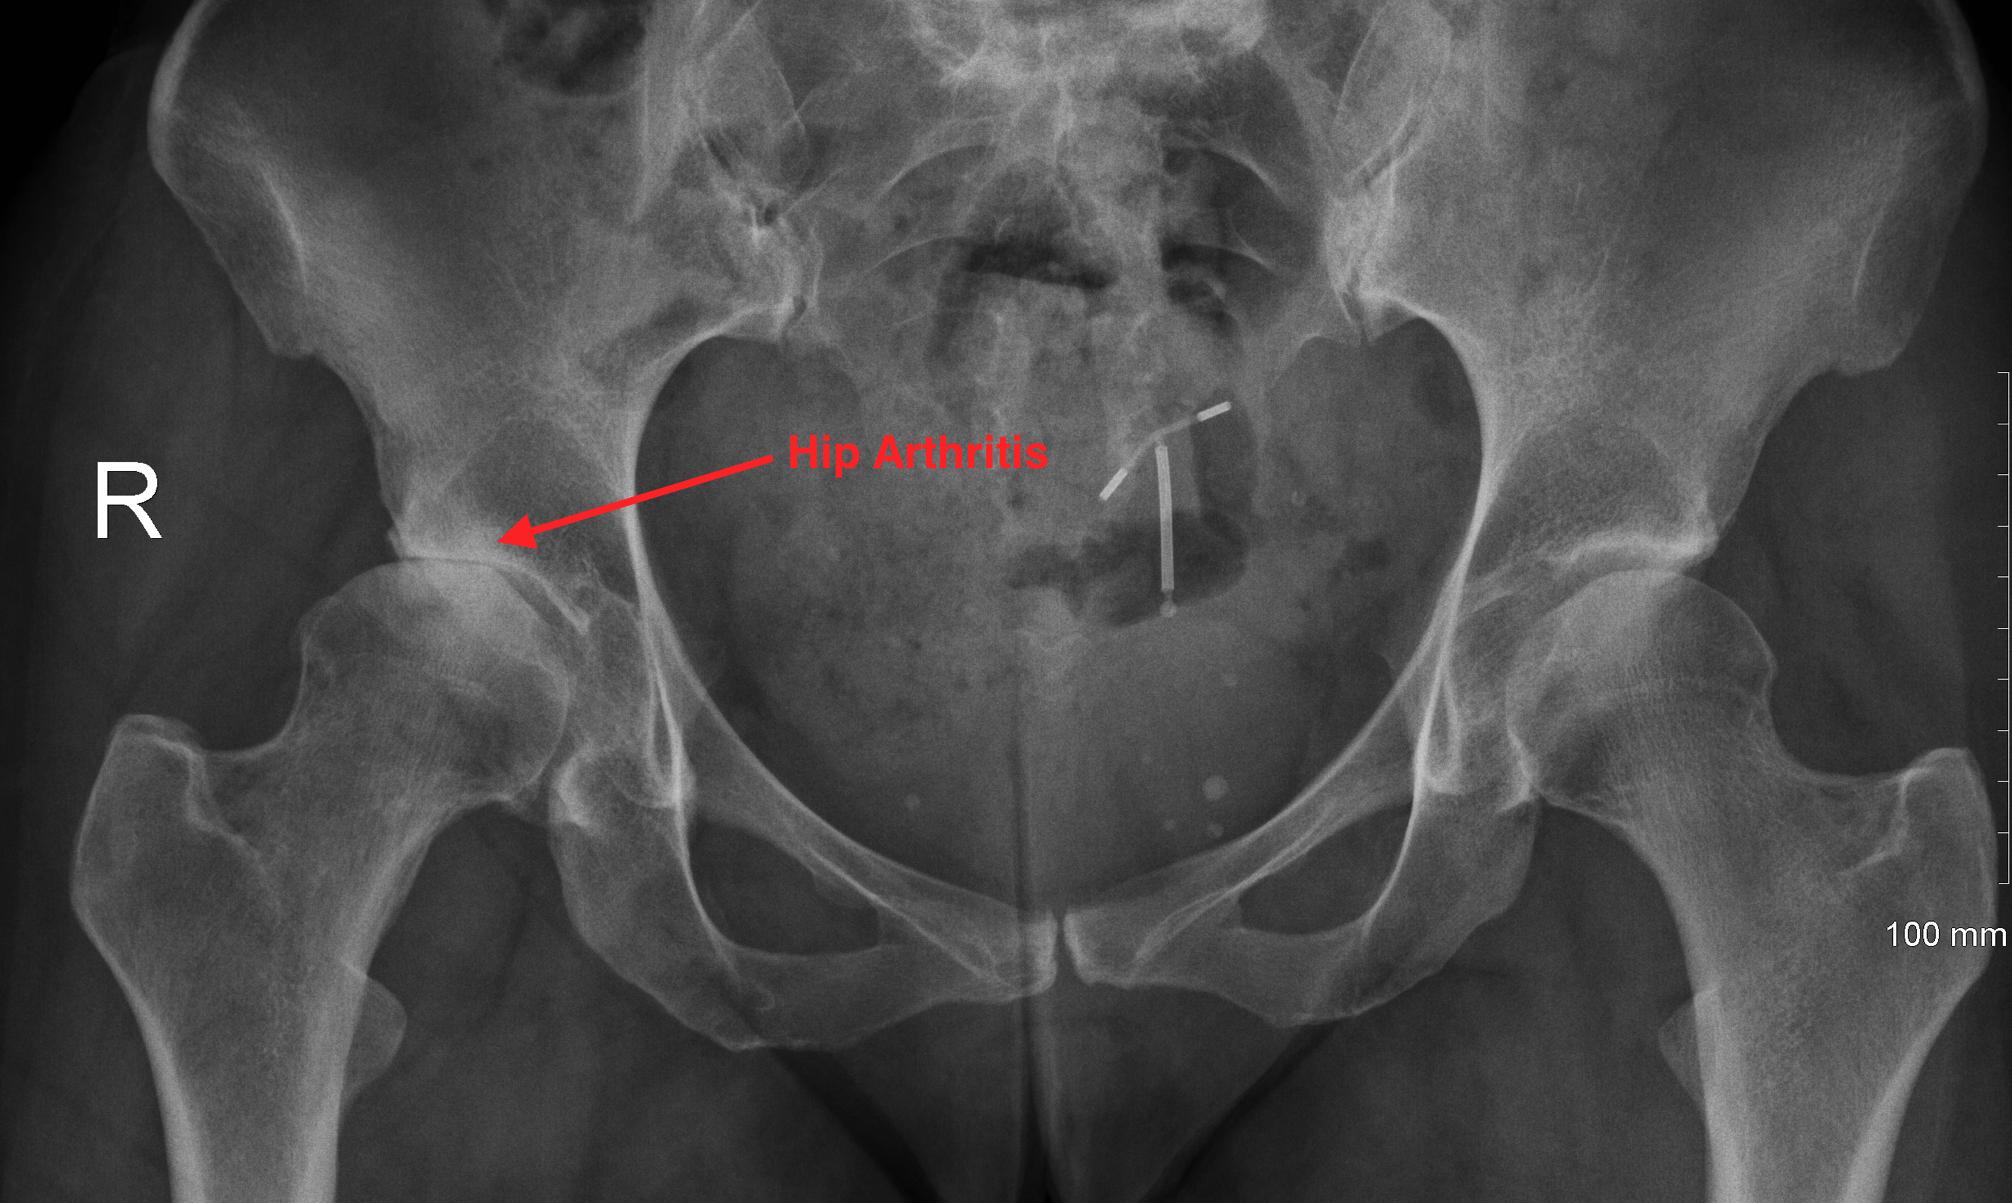 http://www.kneeandhip.co.uk/wp-content/uploads/2016/08/3.-Hip-Arthritis.png